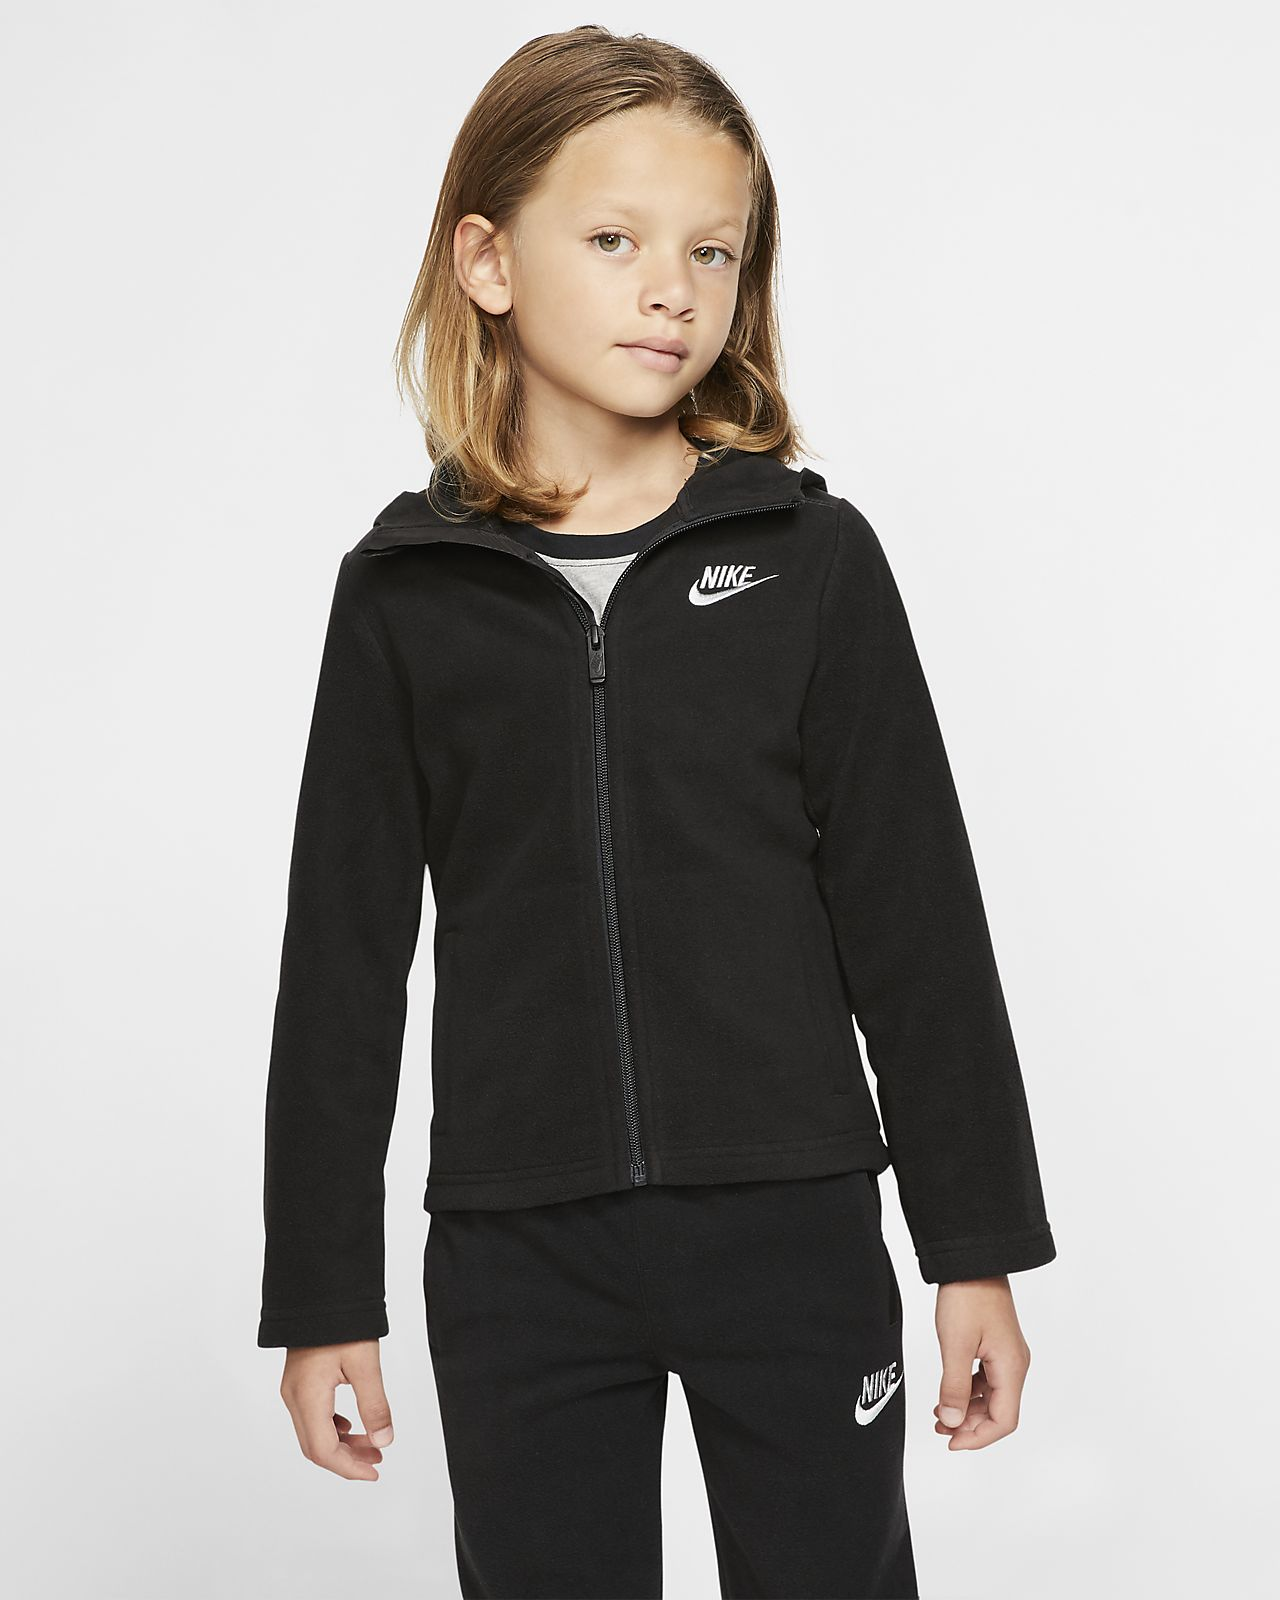 Nike Dri-FIT Younger Kids' Full-Zip Hoodie